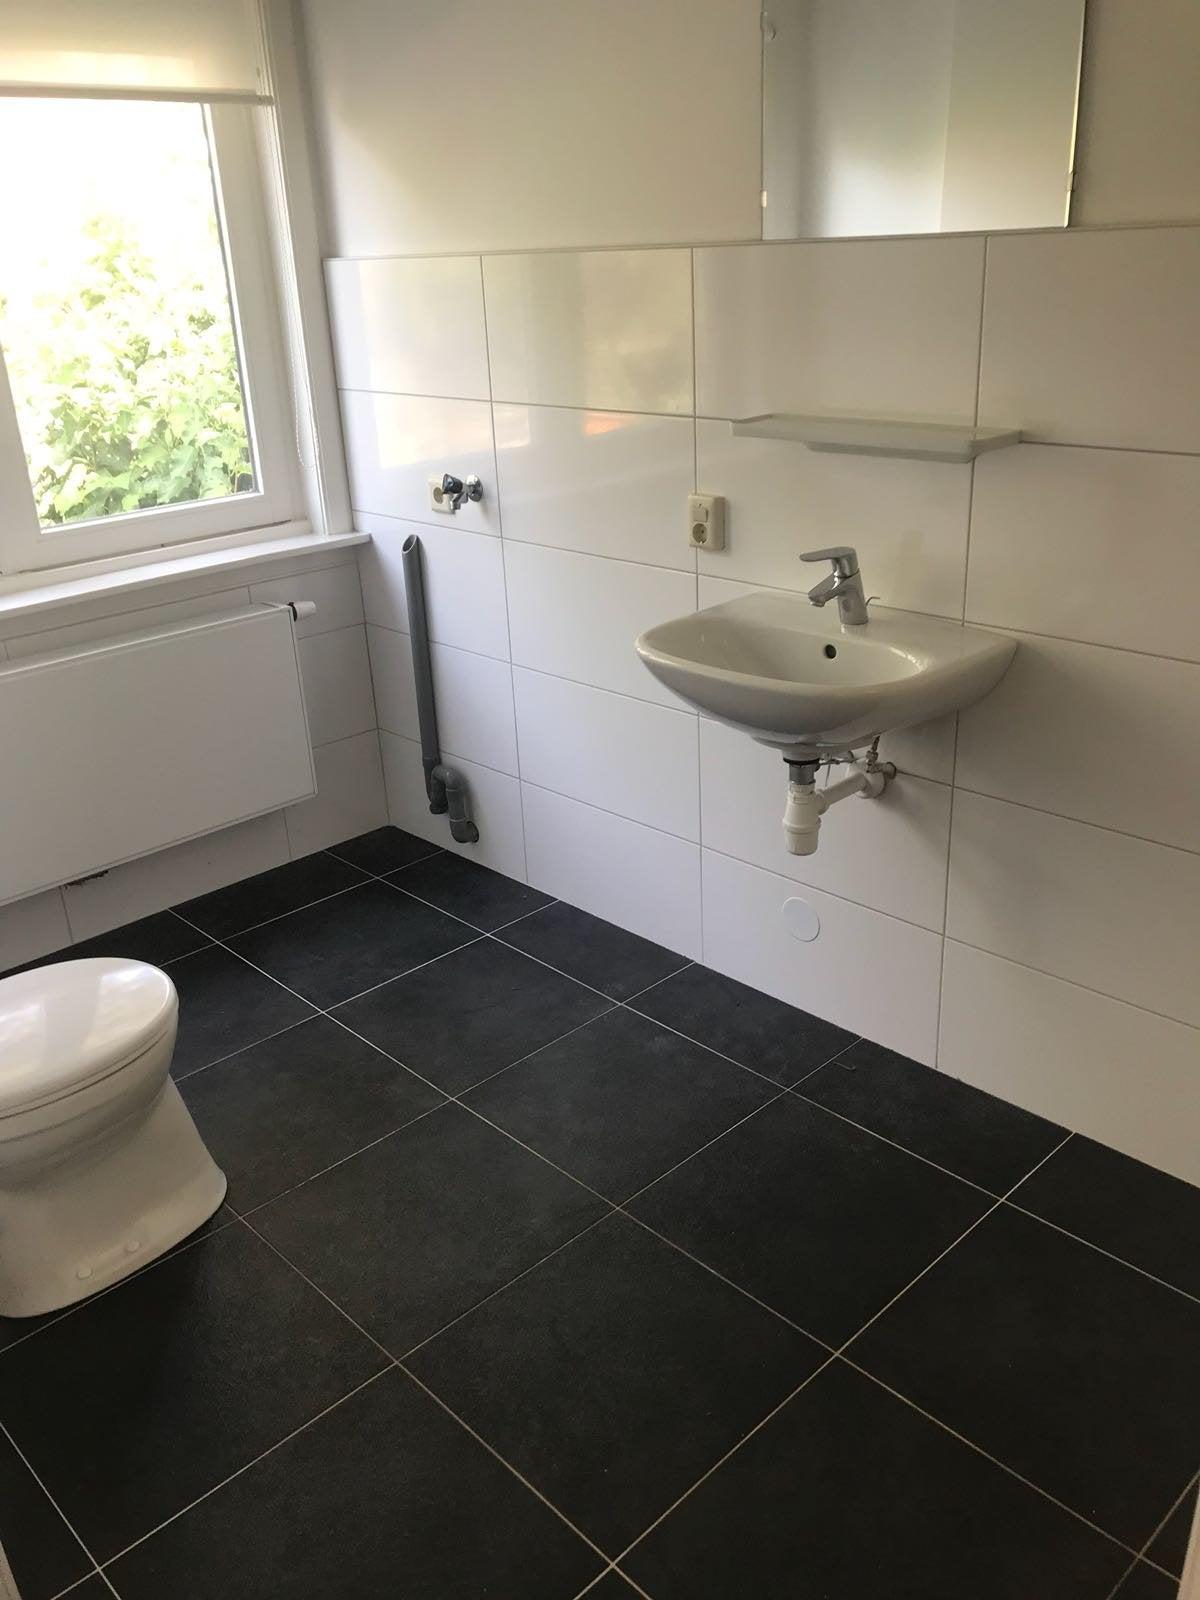 https://public.parariusoffice.nl/298/photos/huge/51744515.1534433860-782.jpeg